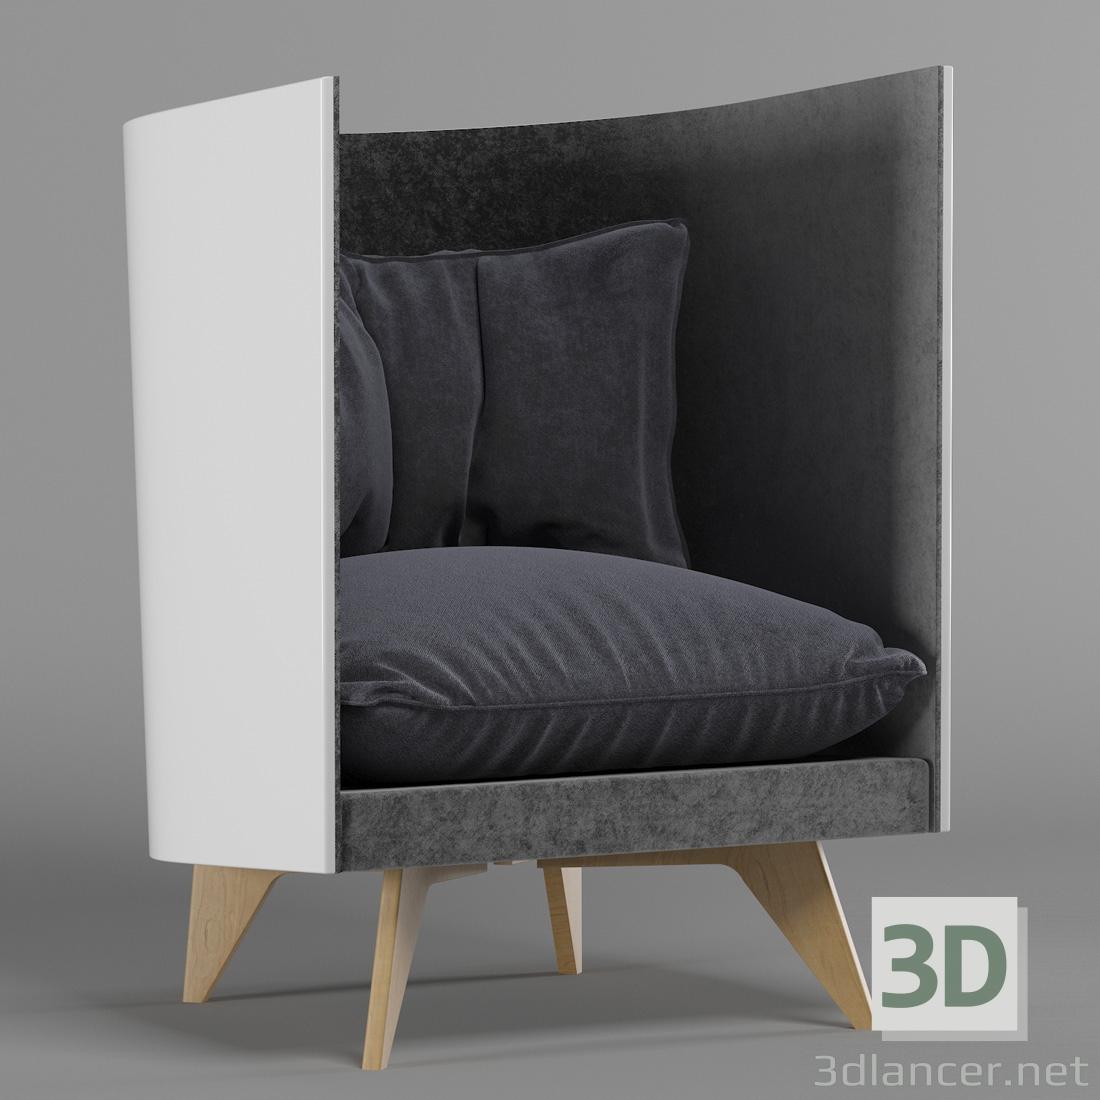 3 डी ODESD2-V1-आर्मचेयर मॉडल खरीद - रेंडर